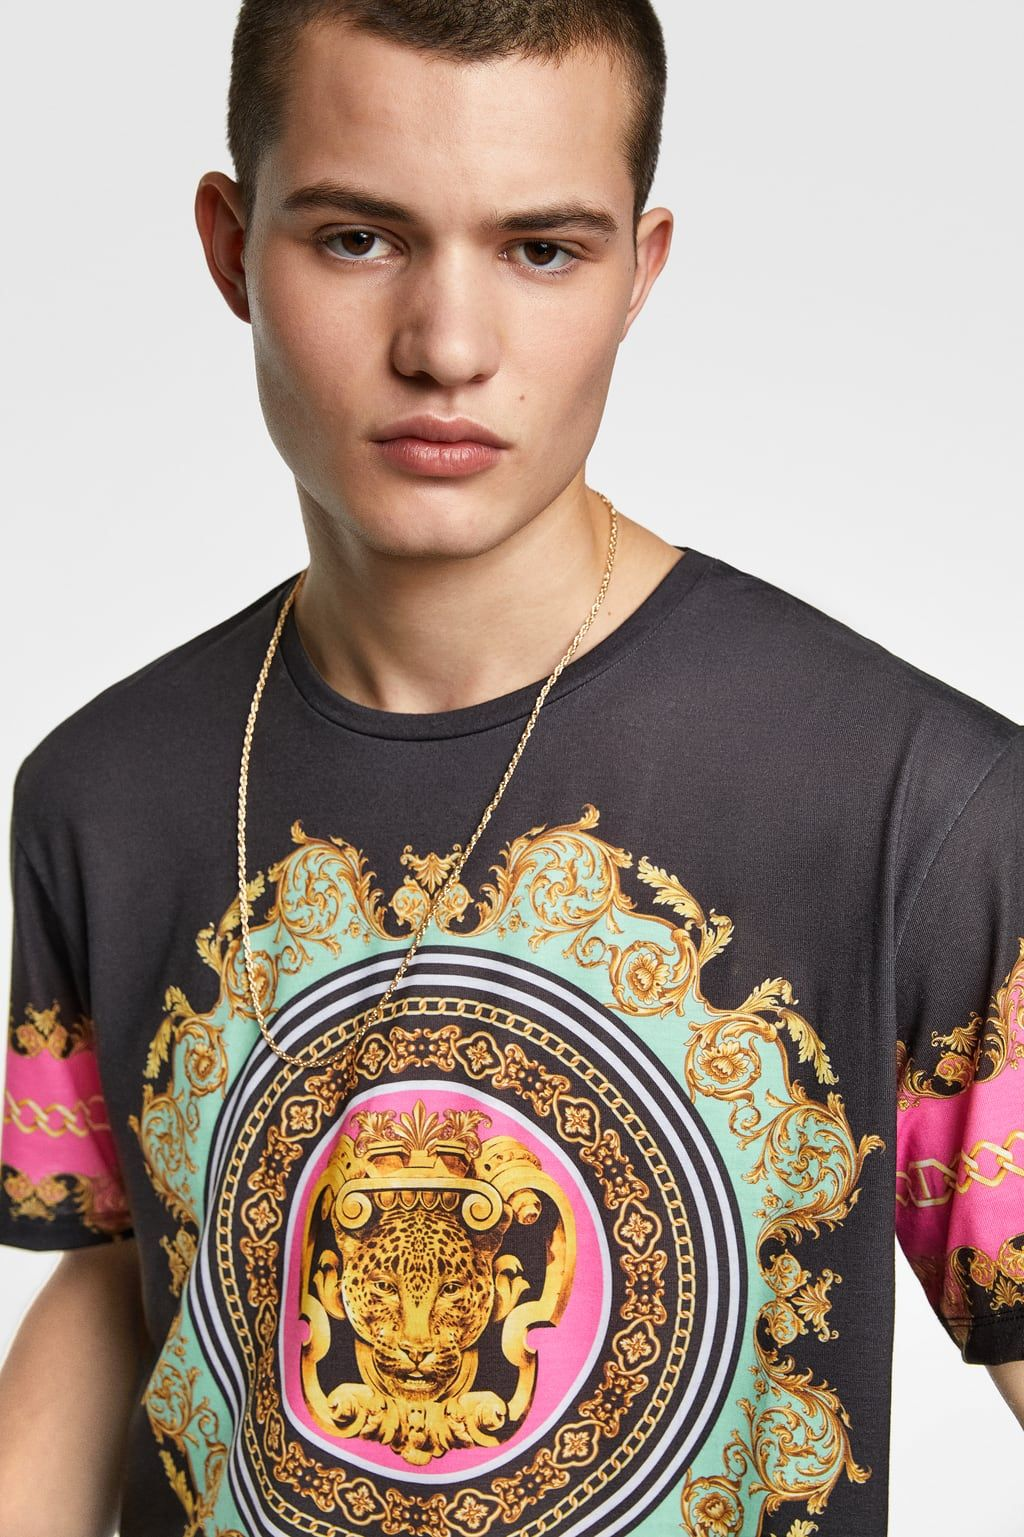 f4f2af4e14 Baroque print t-shirt in 2019 | BAROQUE | Shirts, T shirt, Baroque